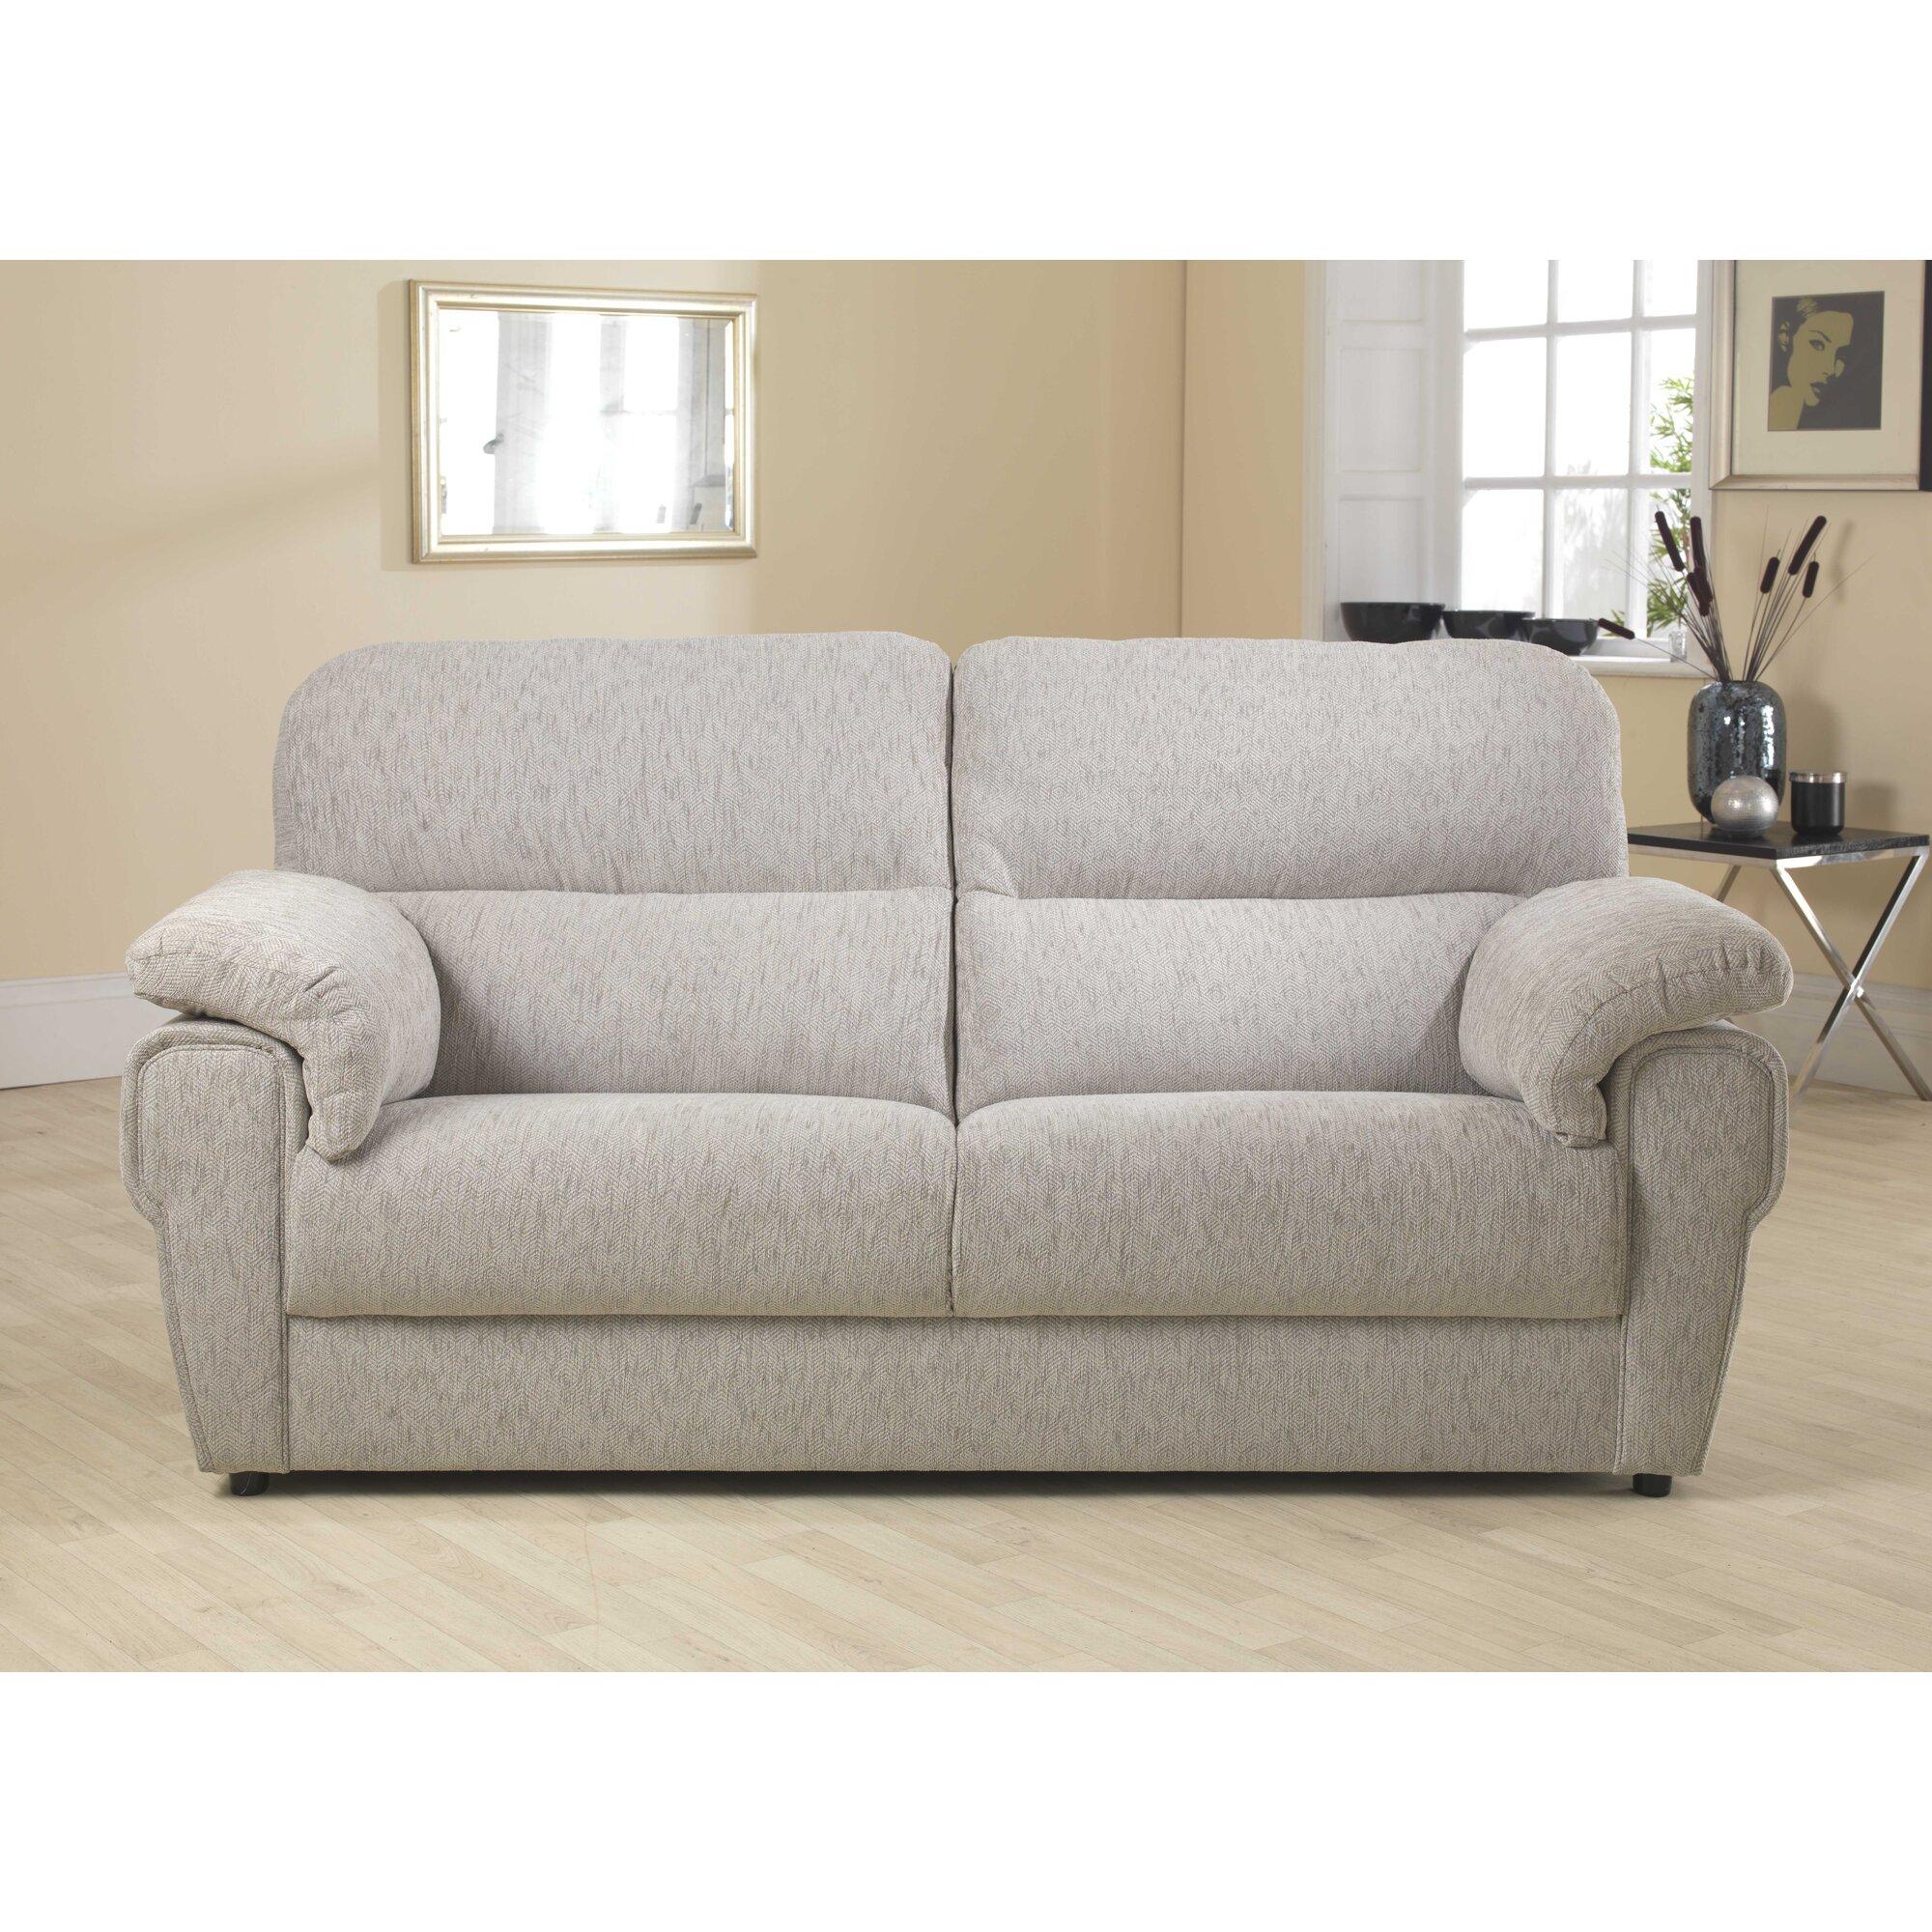 The furniture company ltd madrid 3 seater sofa for Sofas 2 plazas baratos madrid